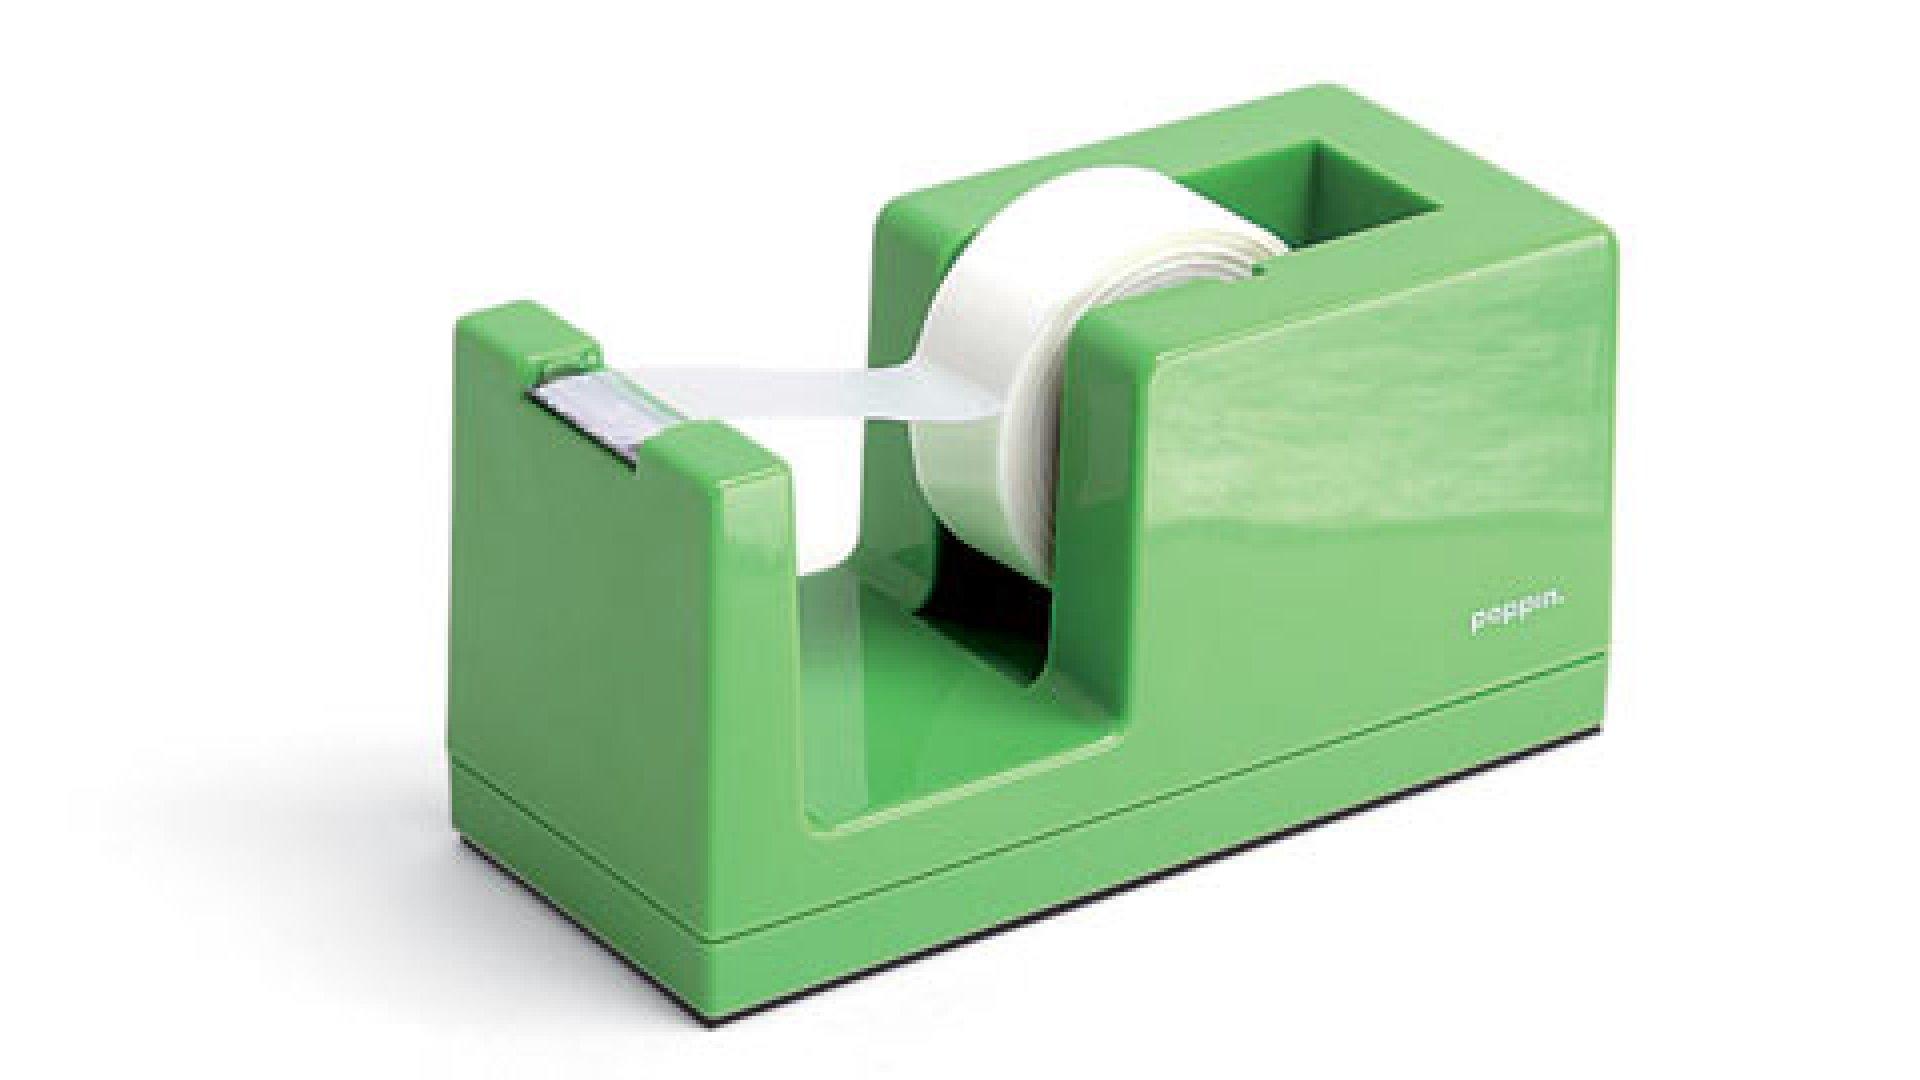 Chris Burch will make your tape dispenser beautiful.